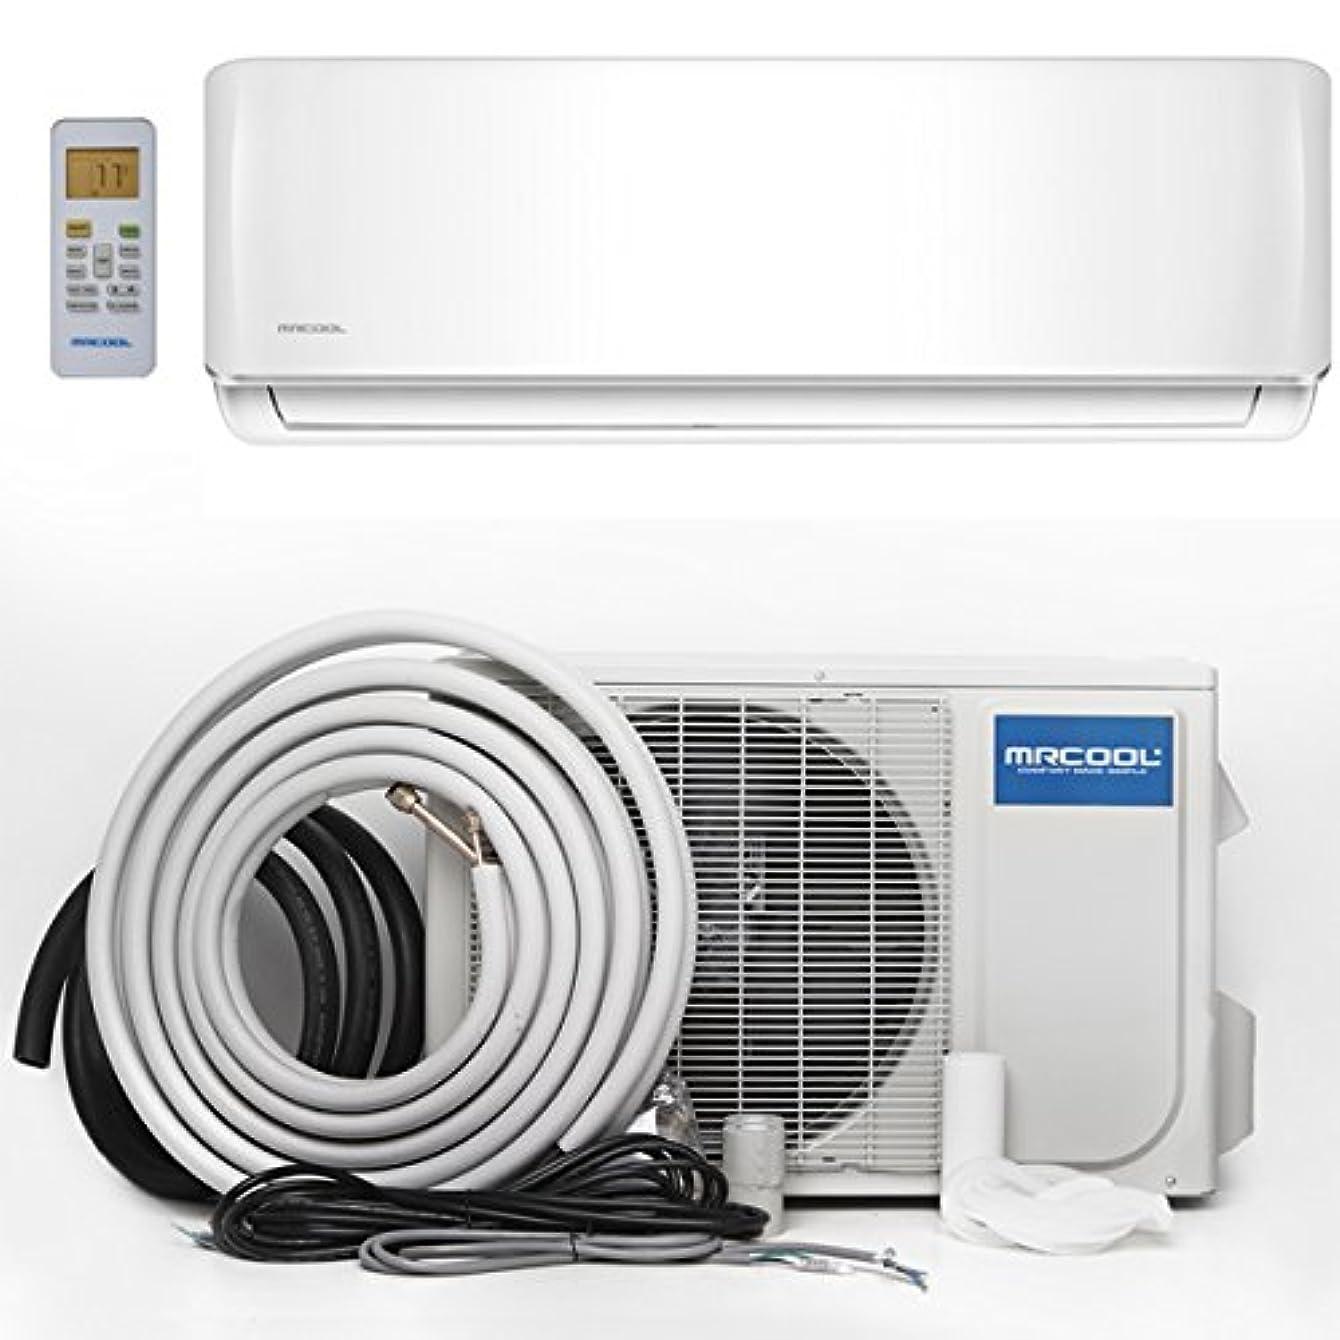 Advantage 24,000 BTU 2 Ton Ductless Mini-Split Air Conditioner and Heat Pump - 230V/60Hz